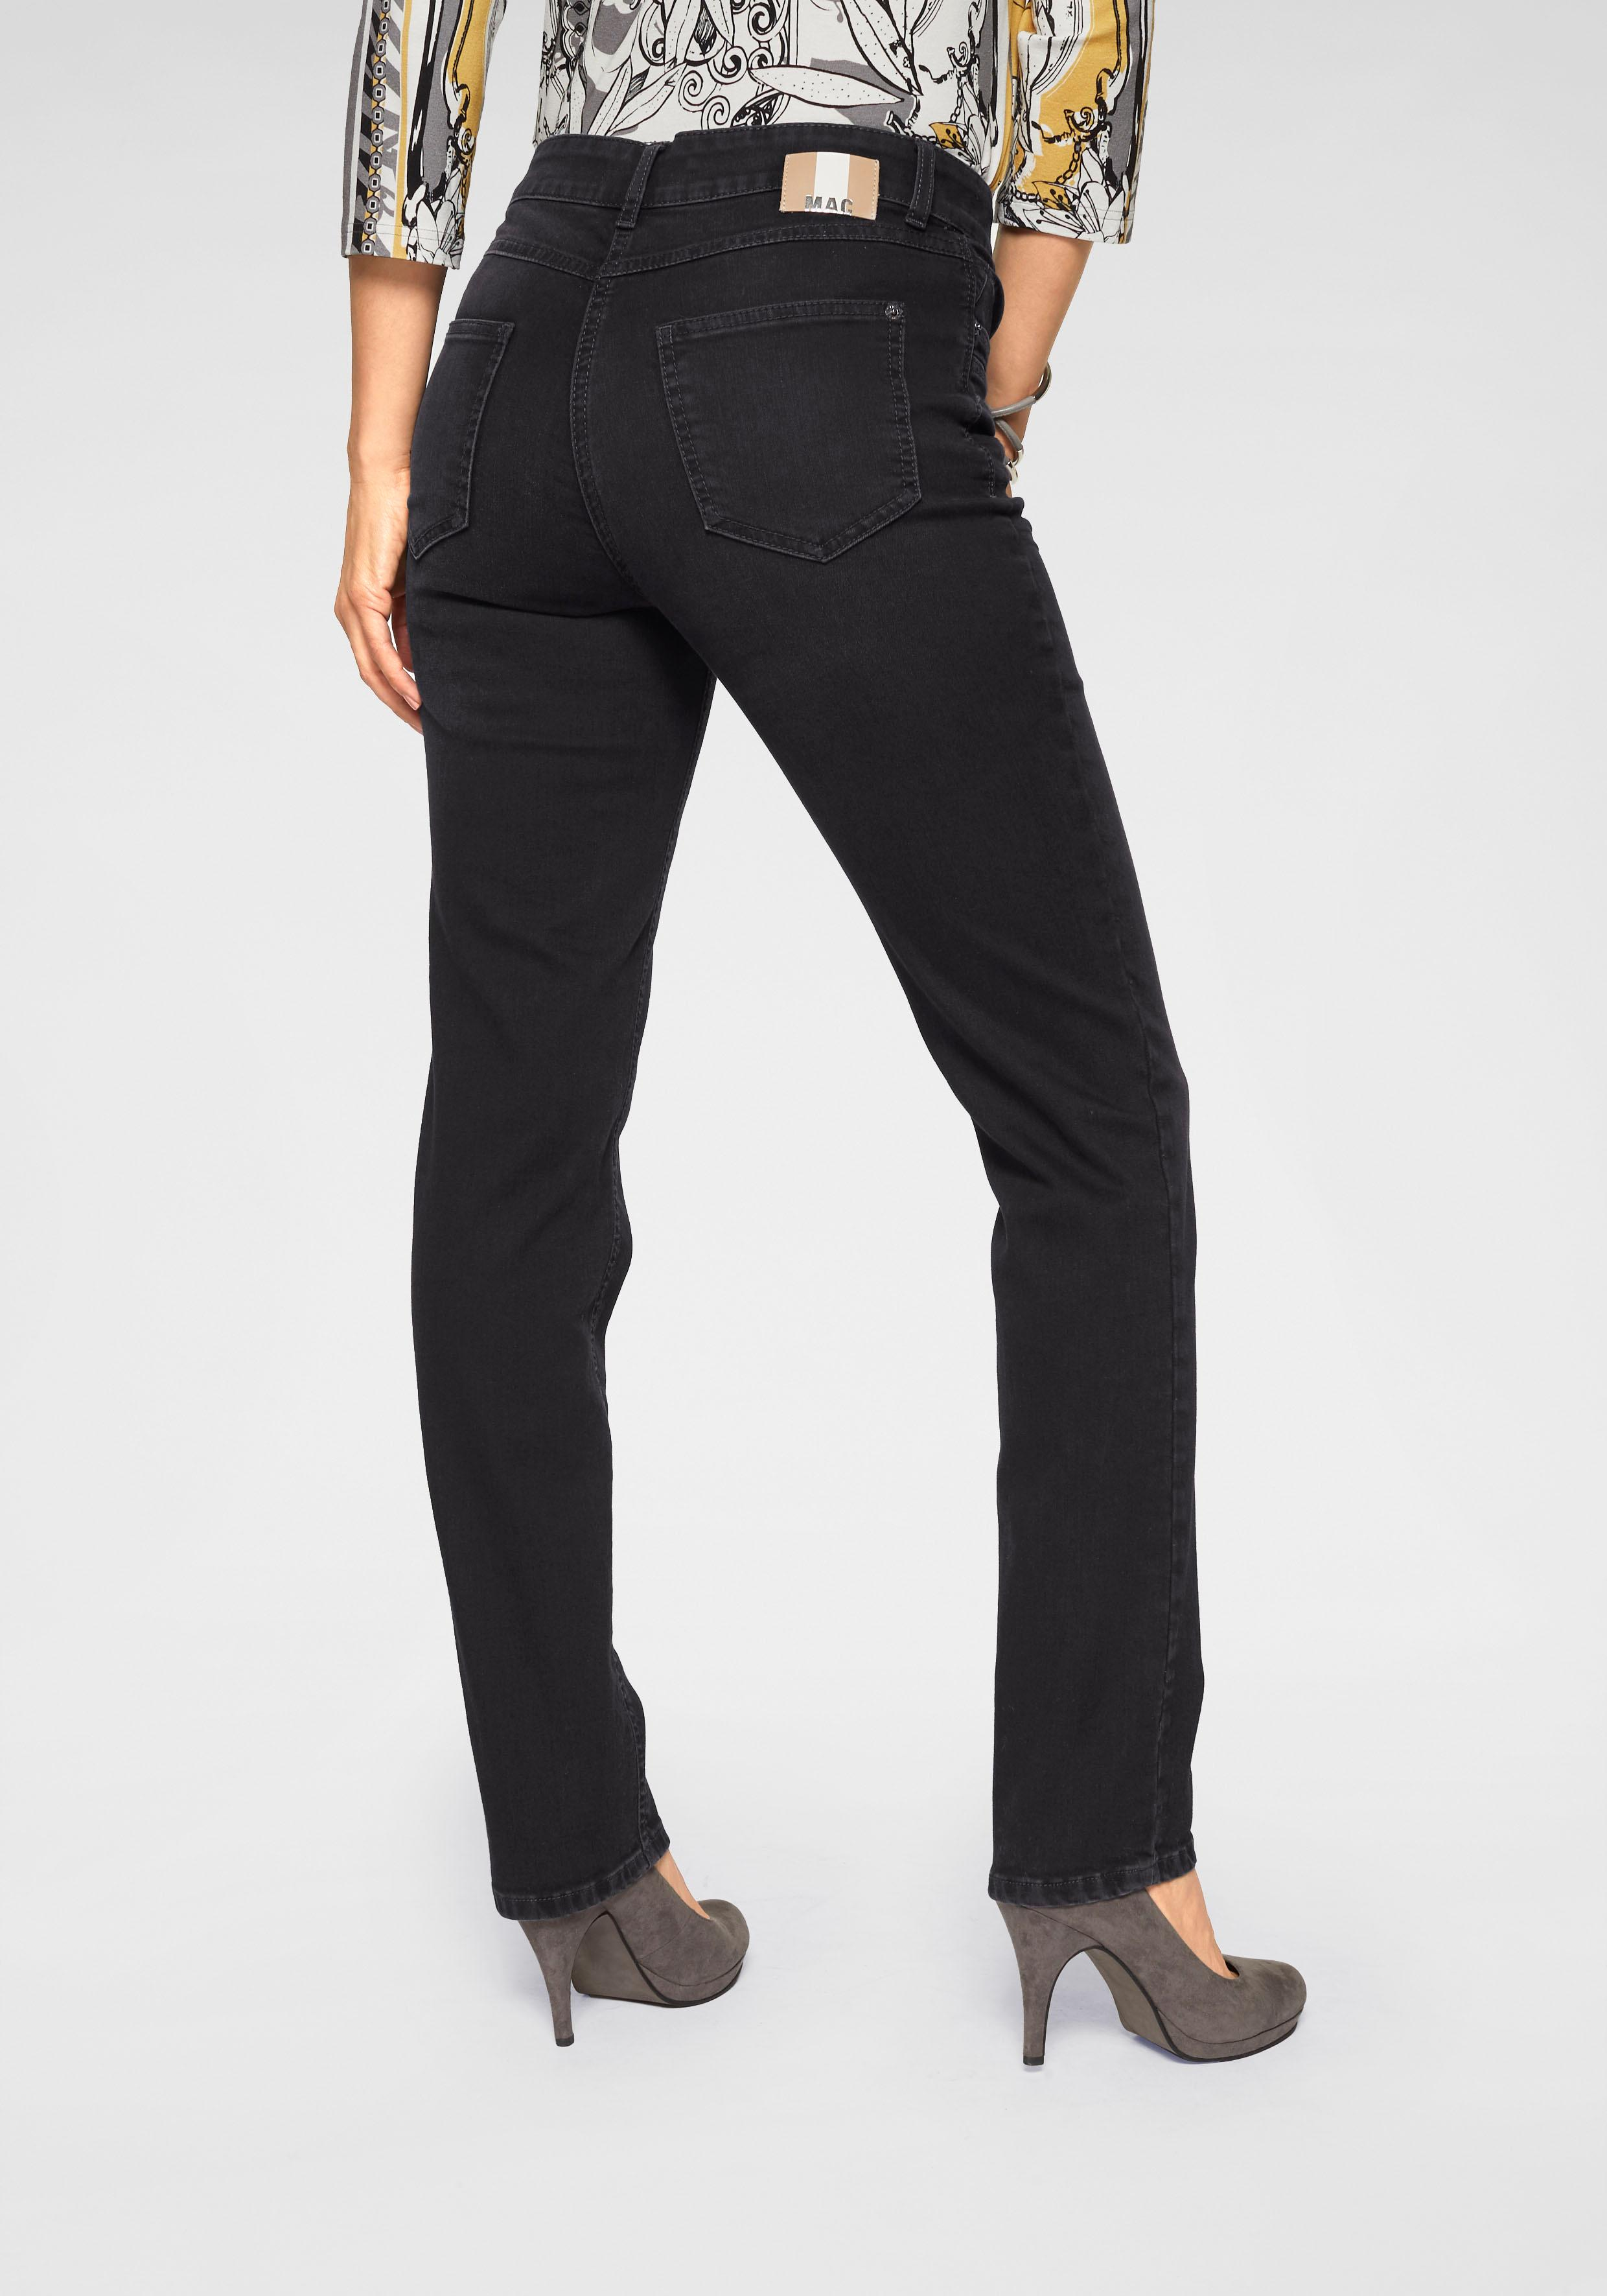 MAC Gerade Jeans Melanie New | Bekleidung > Jeans > Gerade Jeans | Mac